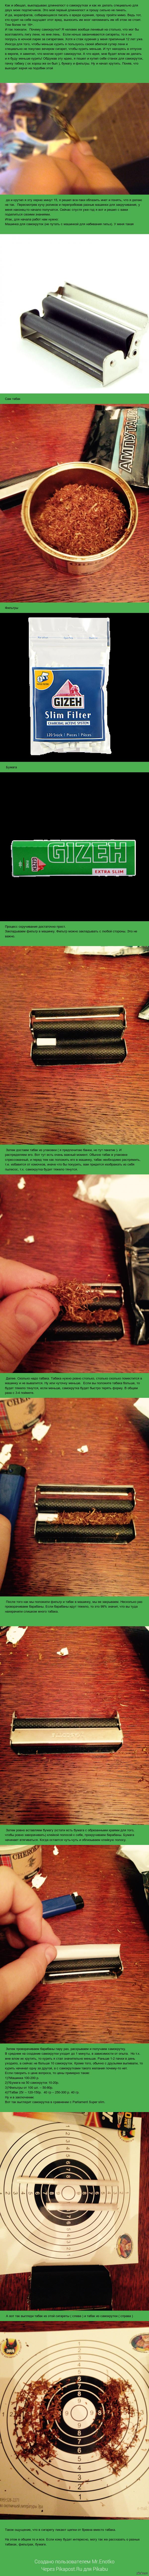 Какой лучше сорт табака?